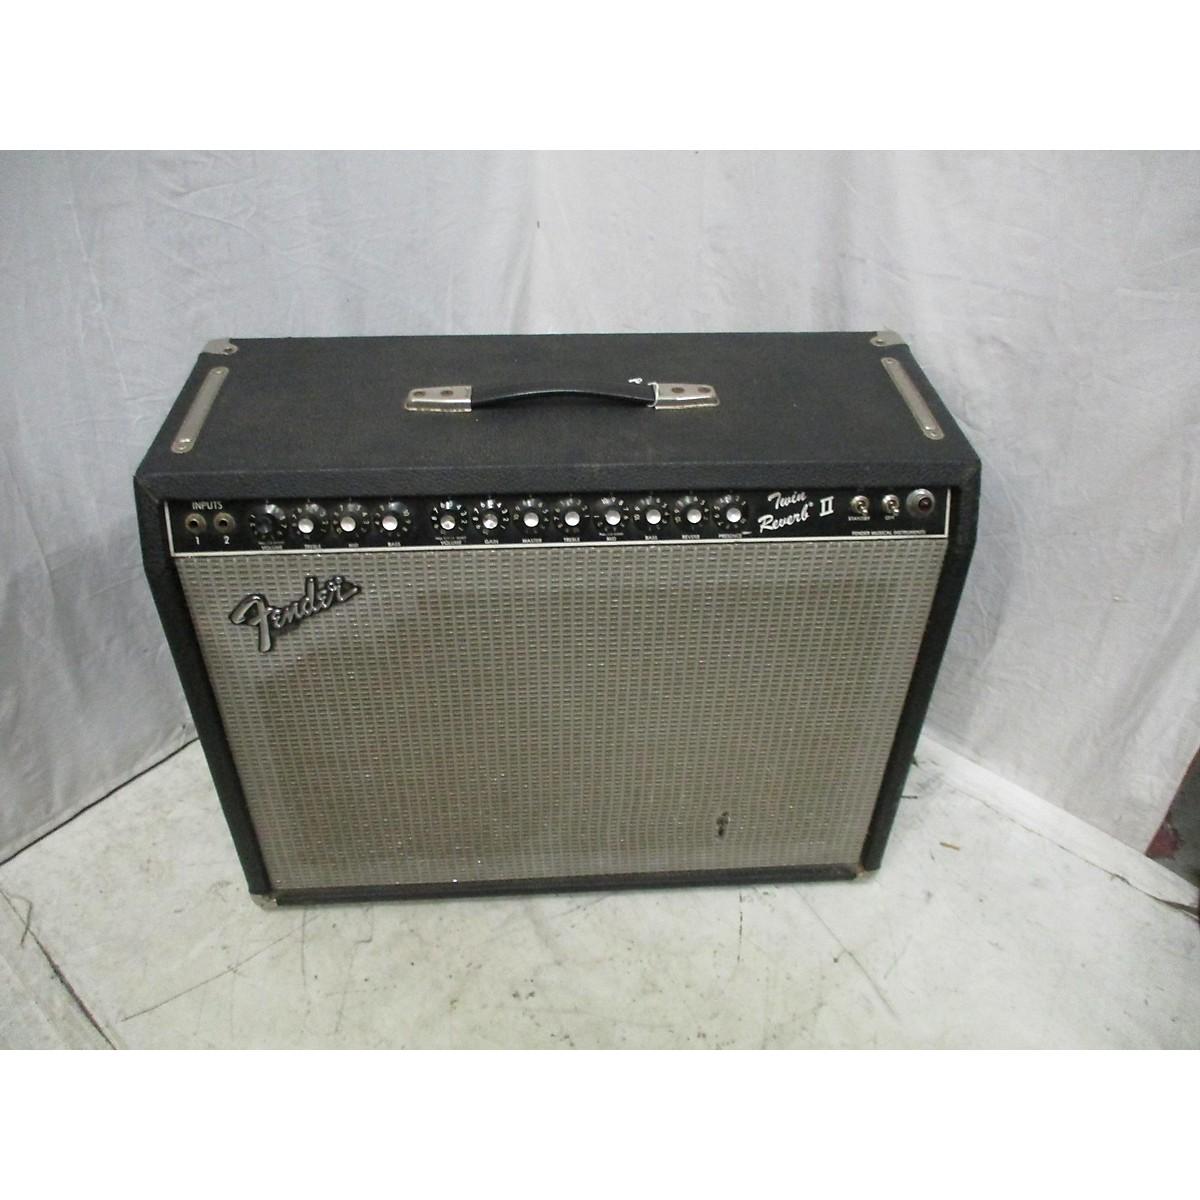 Fender 1980s Twin Reverb II 2x12 Tube Guitar Combo Amp